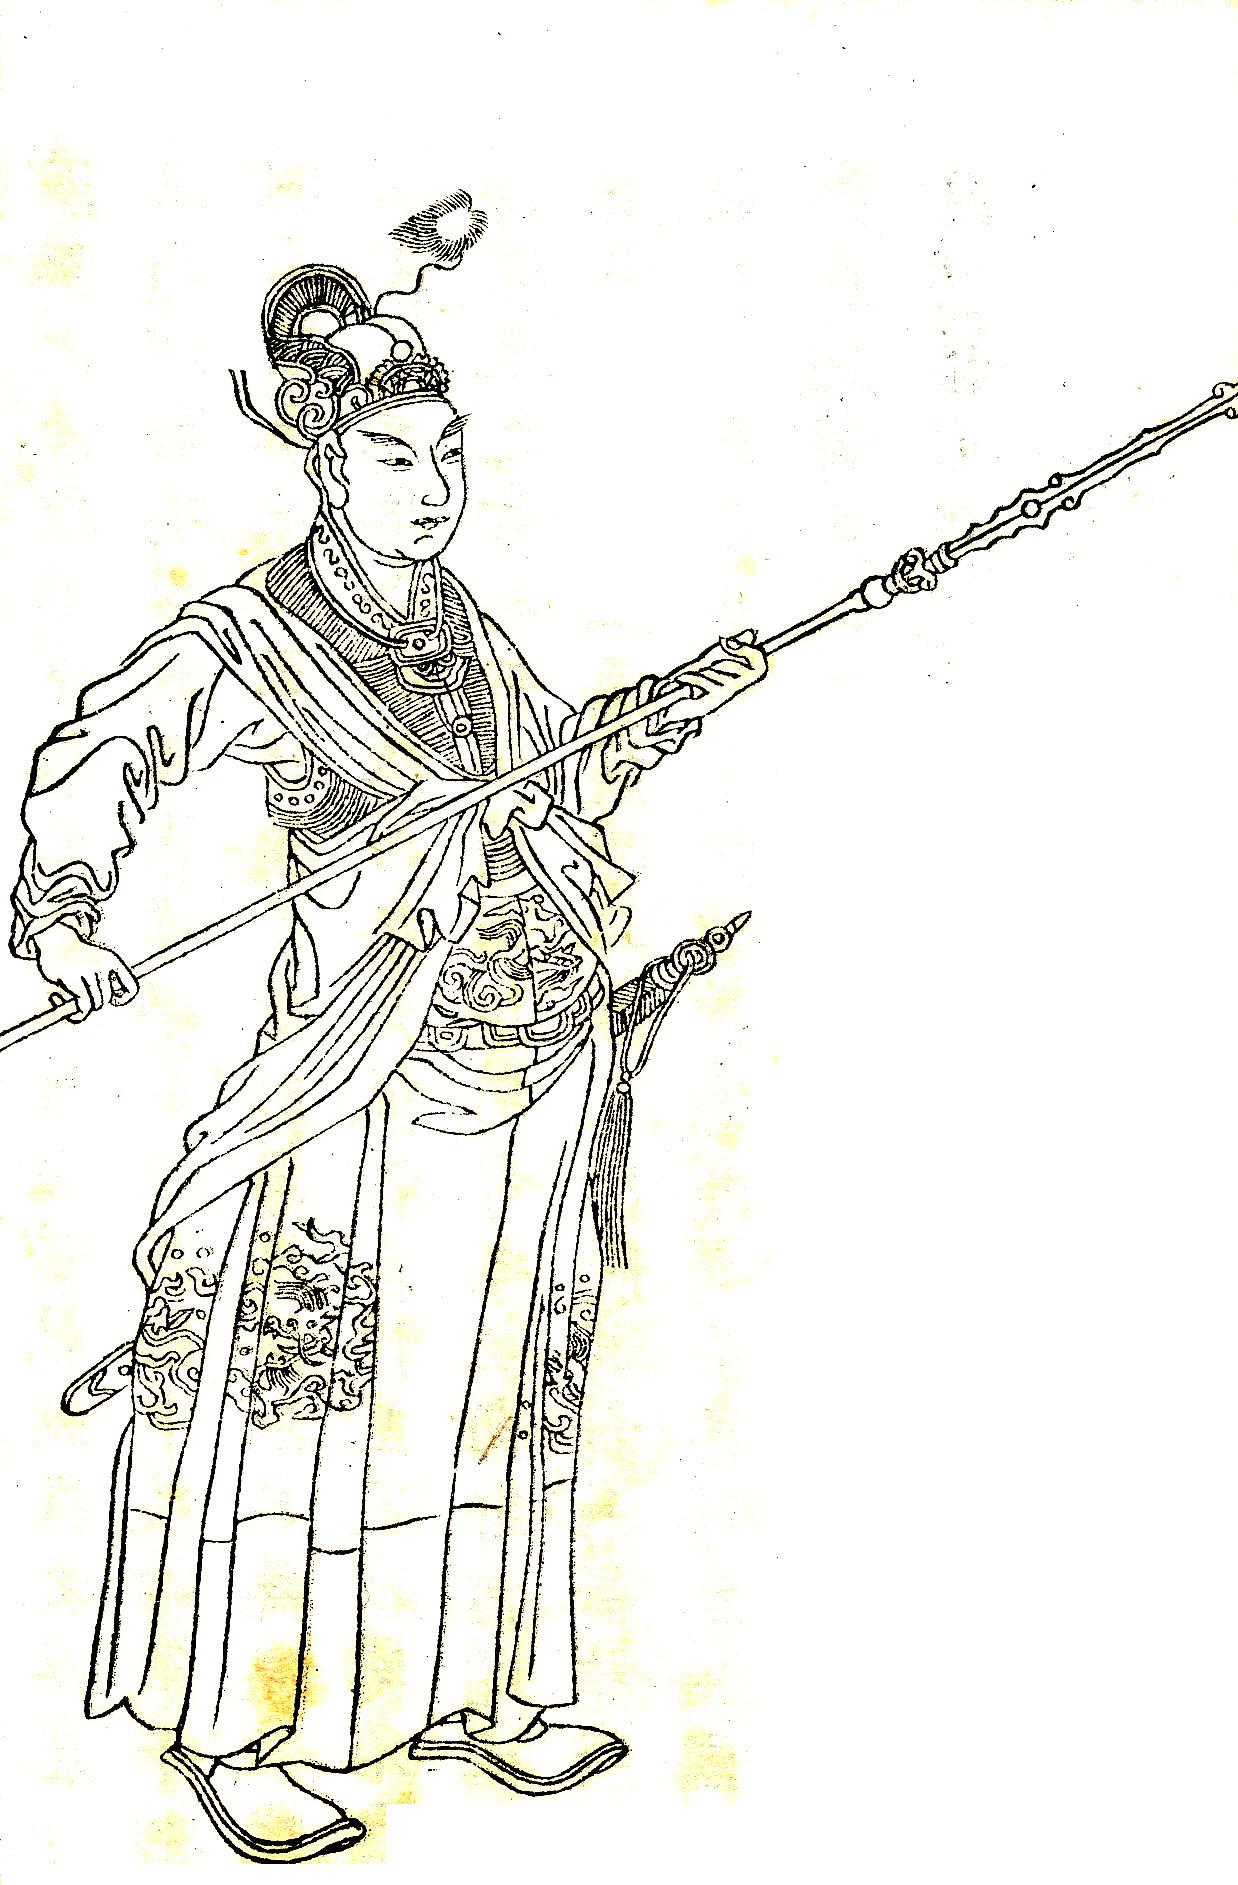 Han Xin (Image: wikimedia / CC0 1.0)